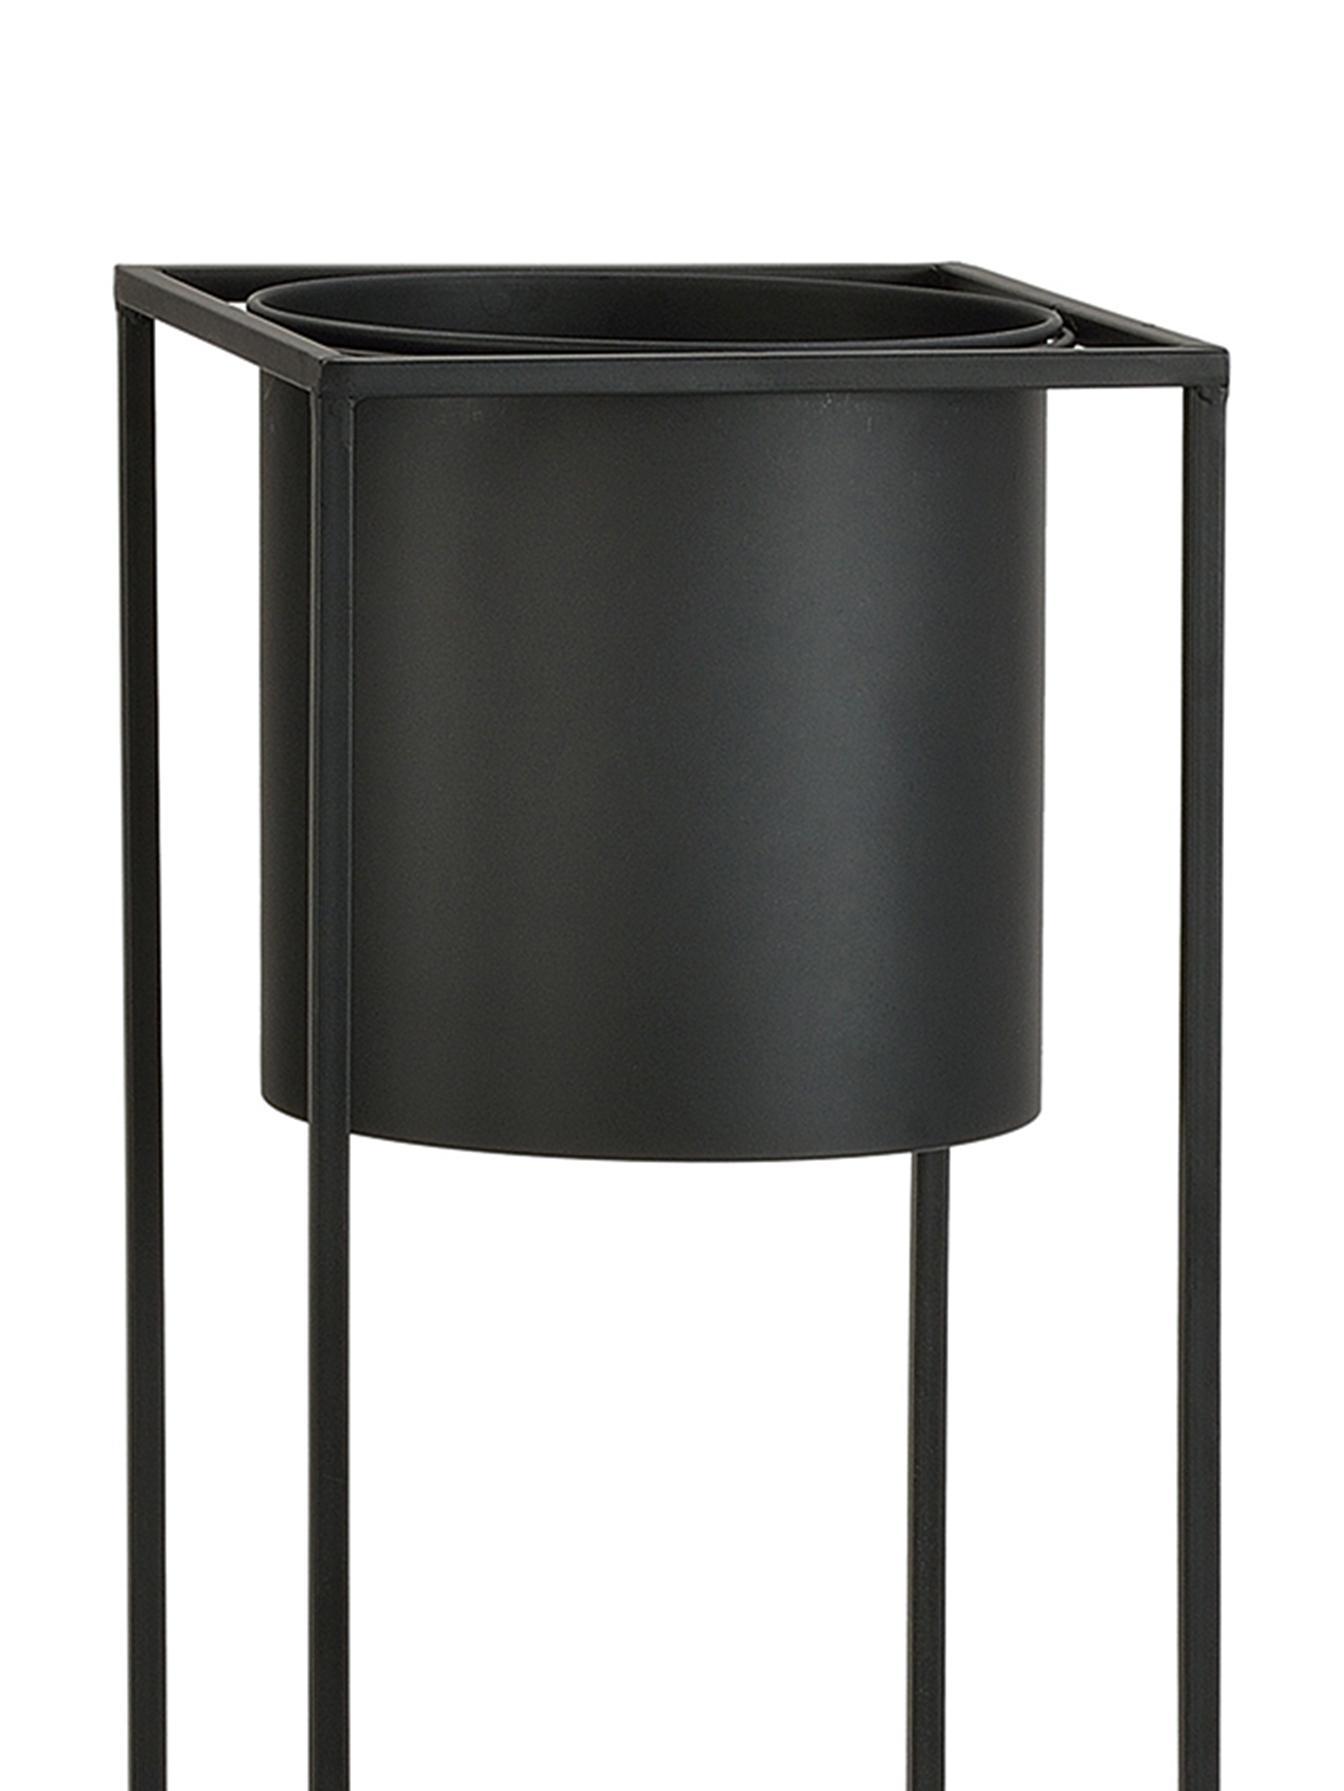 Grand cache-pot en métal Bragi, Noir